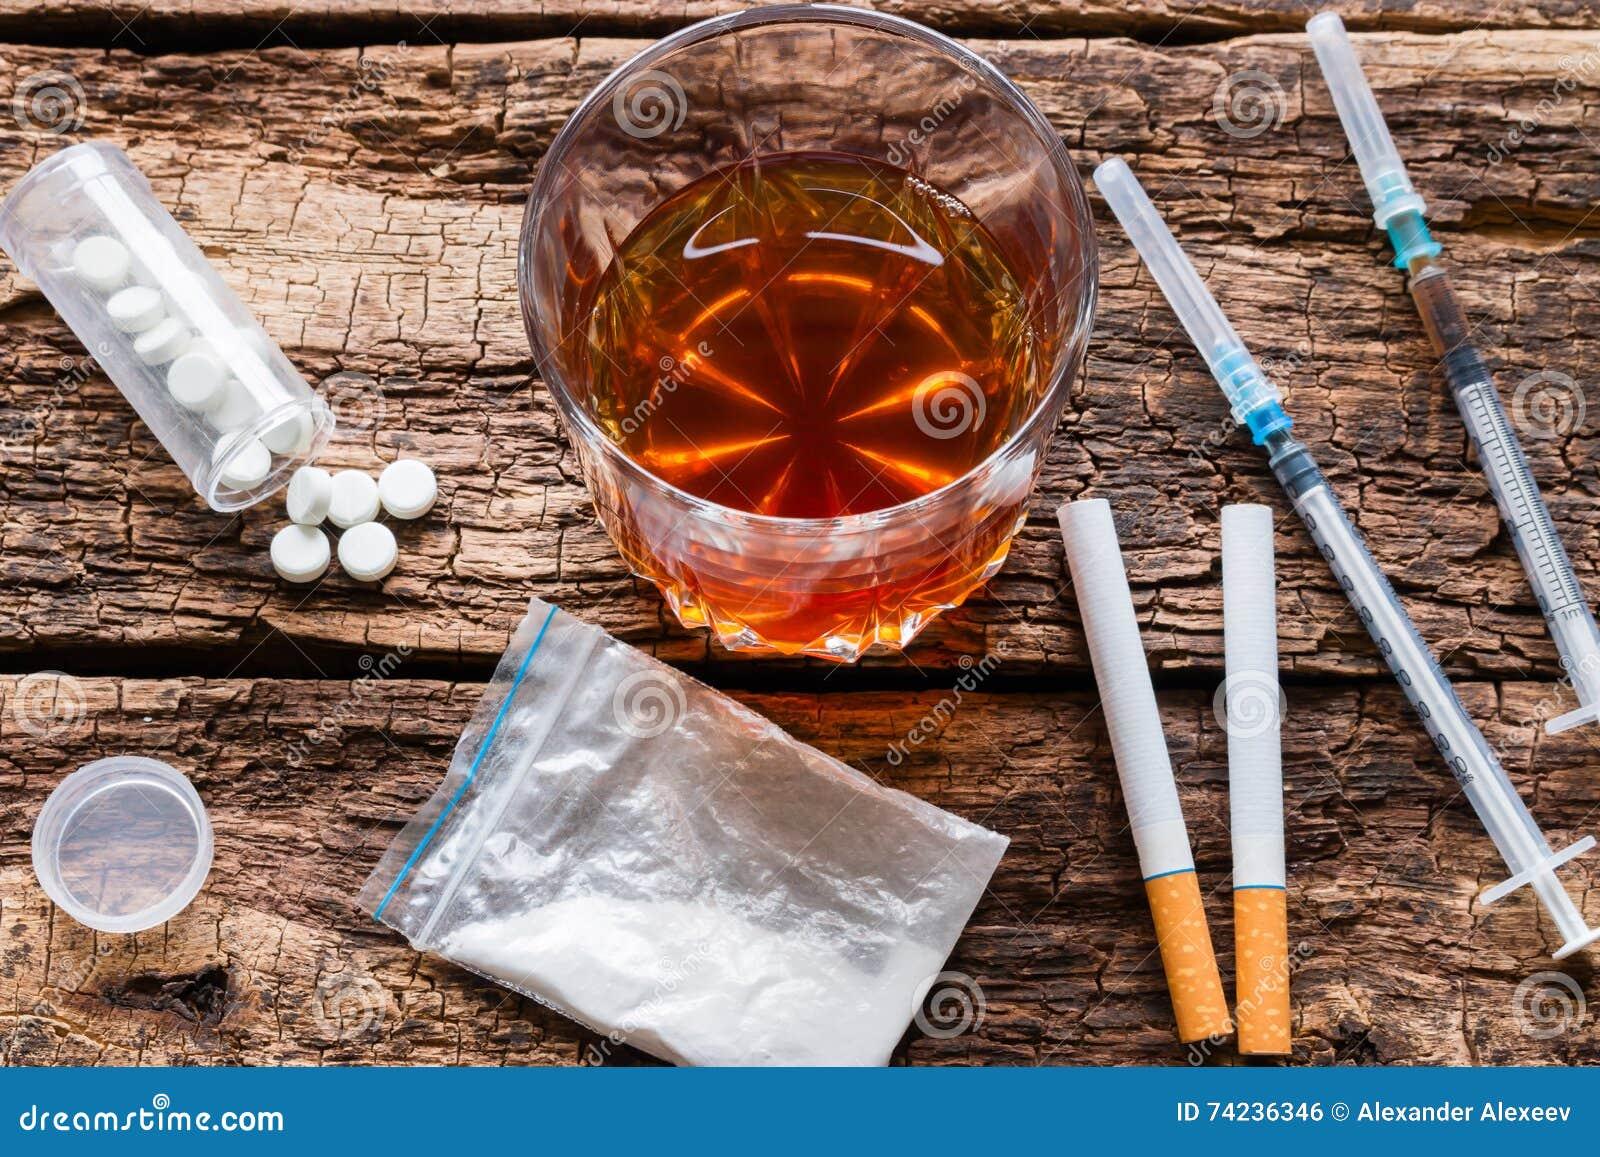 Álcool, cigarros e drogas